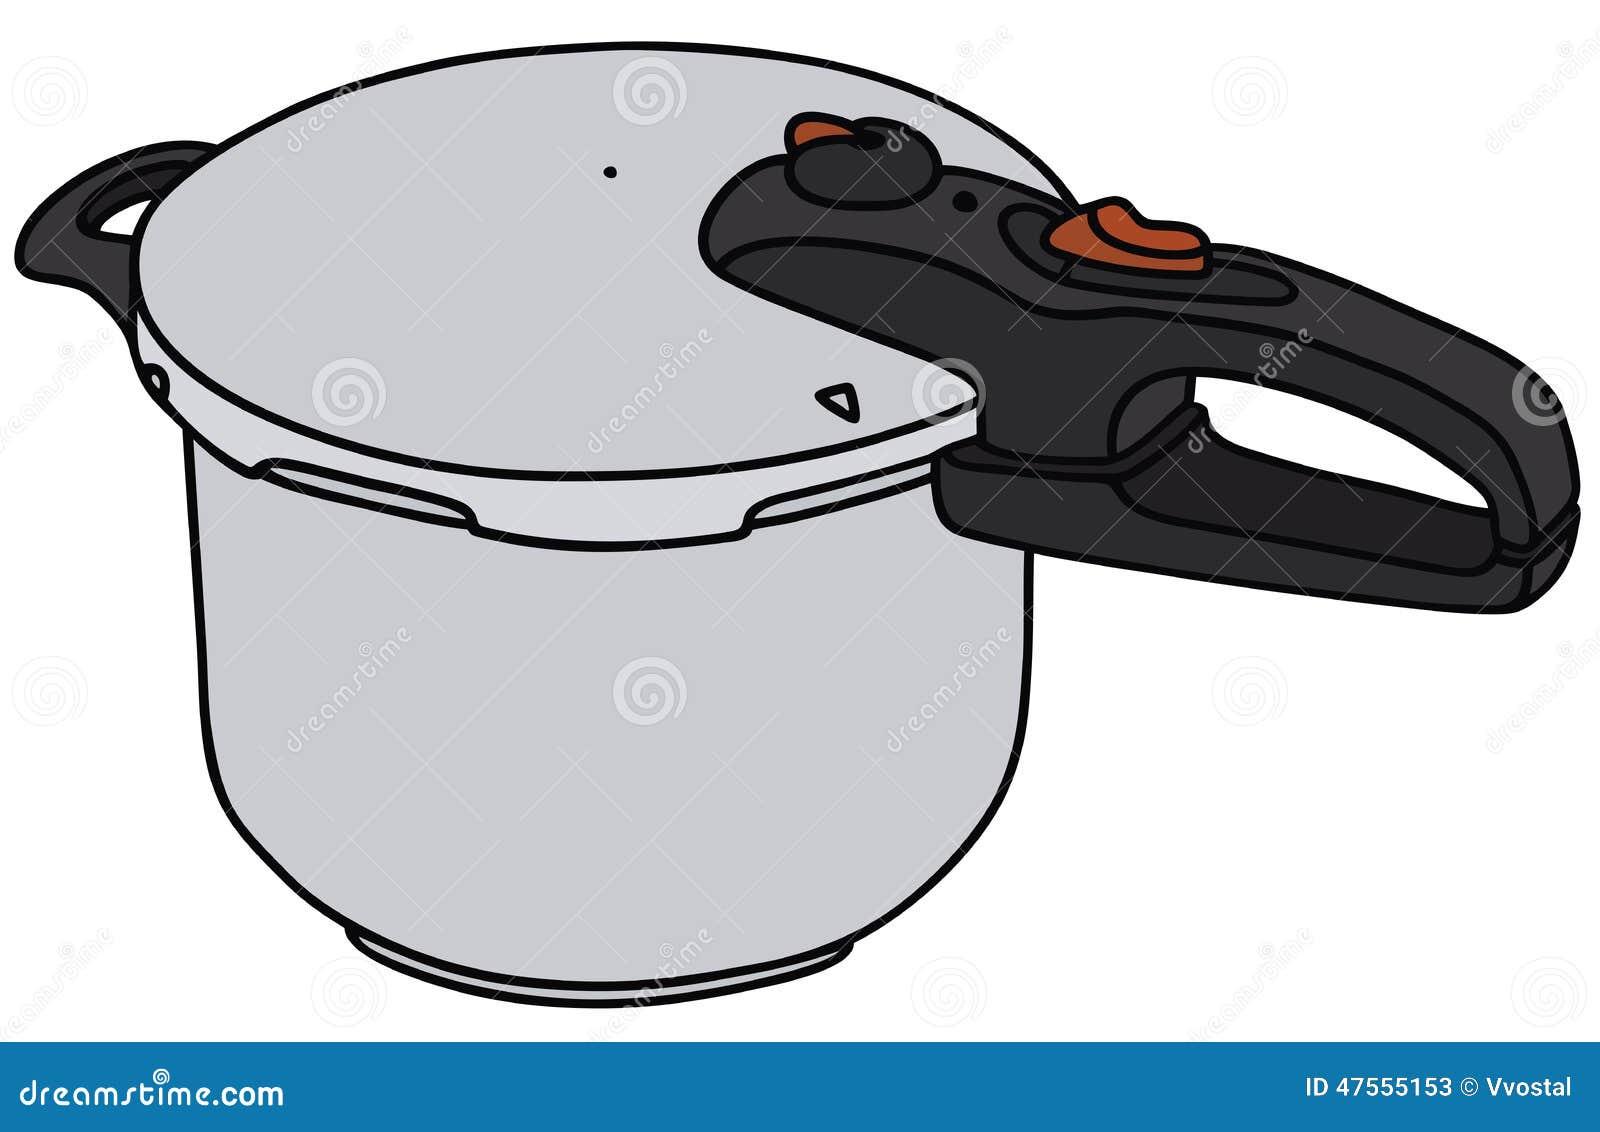 Cartoon Electric Cooker ~ Pressure cooker stock vector image